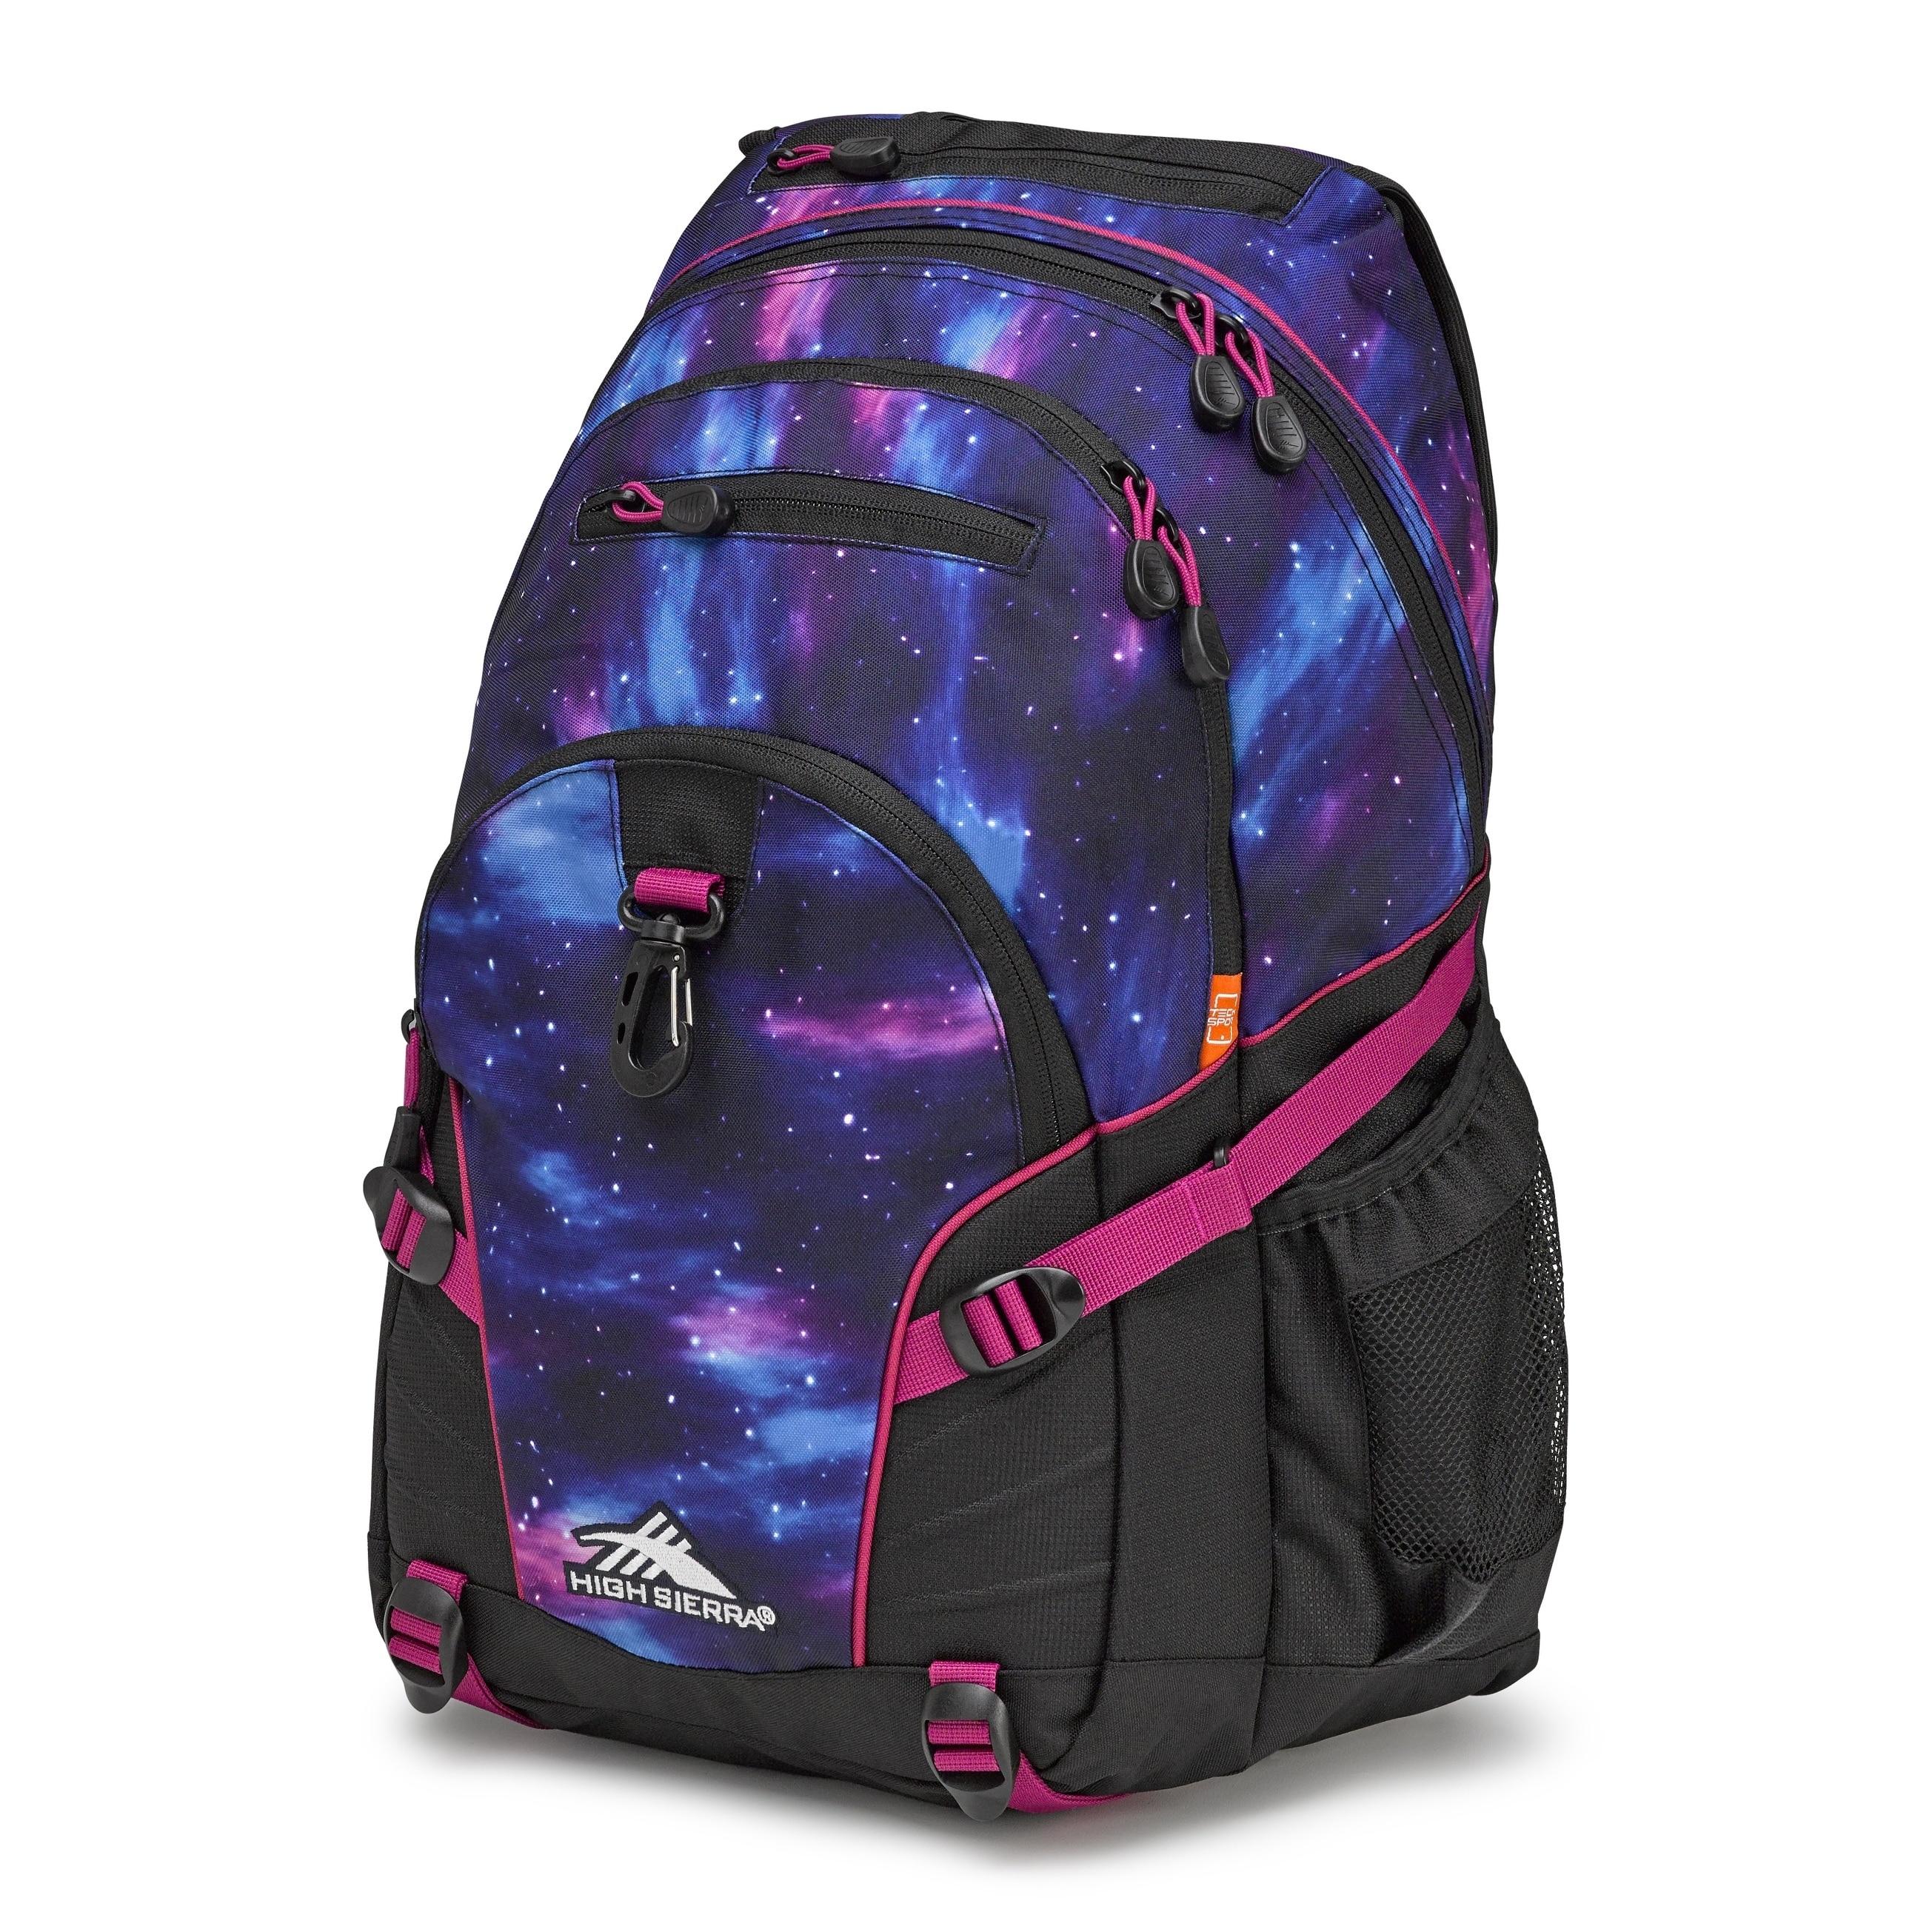 Very Stylish! Brand New!Very high quality HIGH SIERRA GENUINE backpack